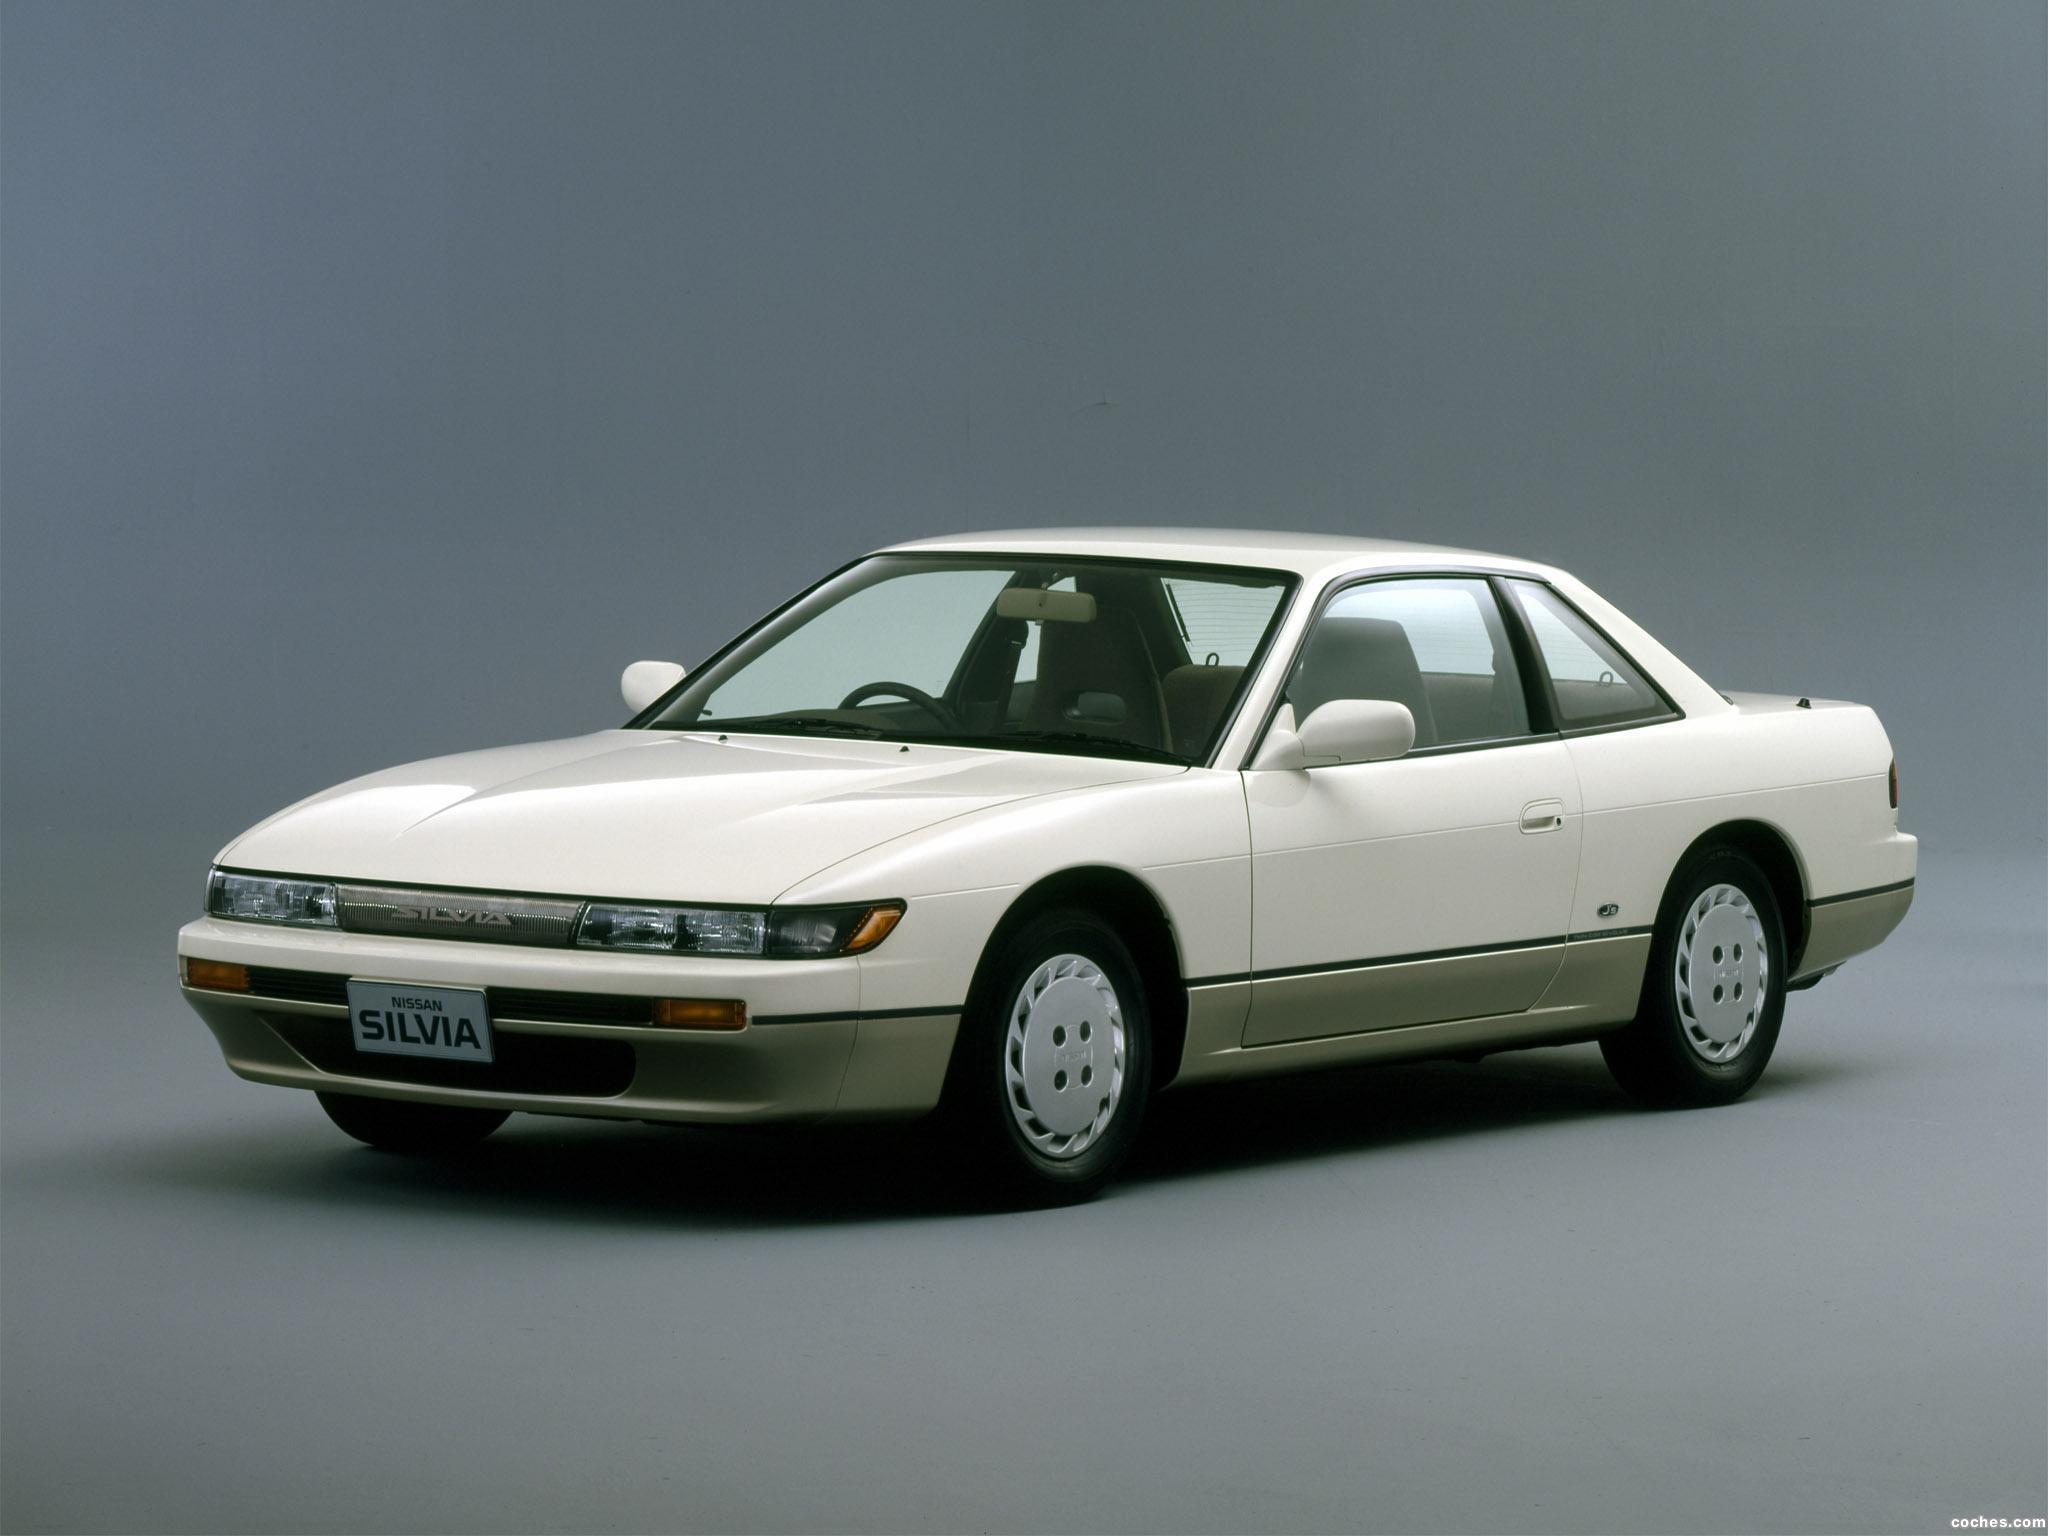 Foto 0 de Nissan Silvia J S13 1988